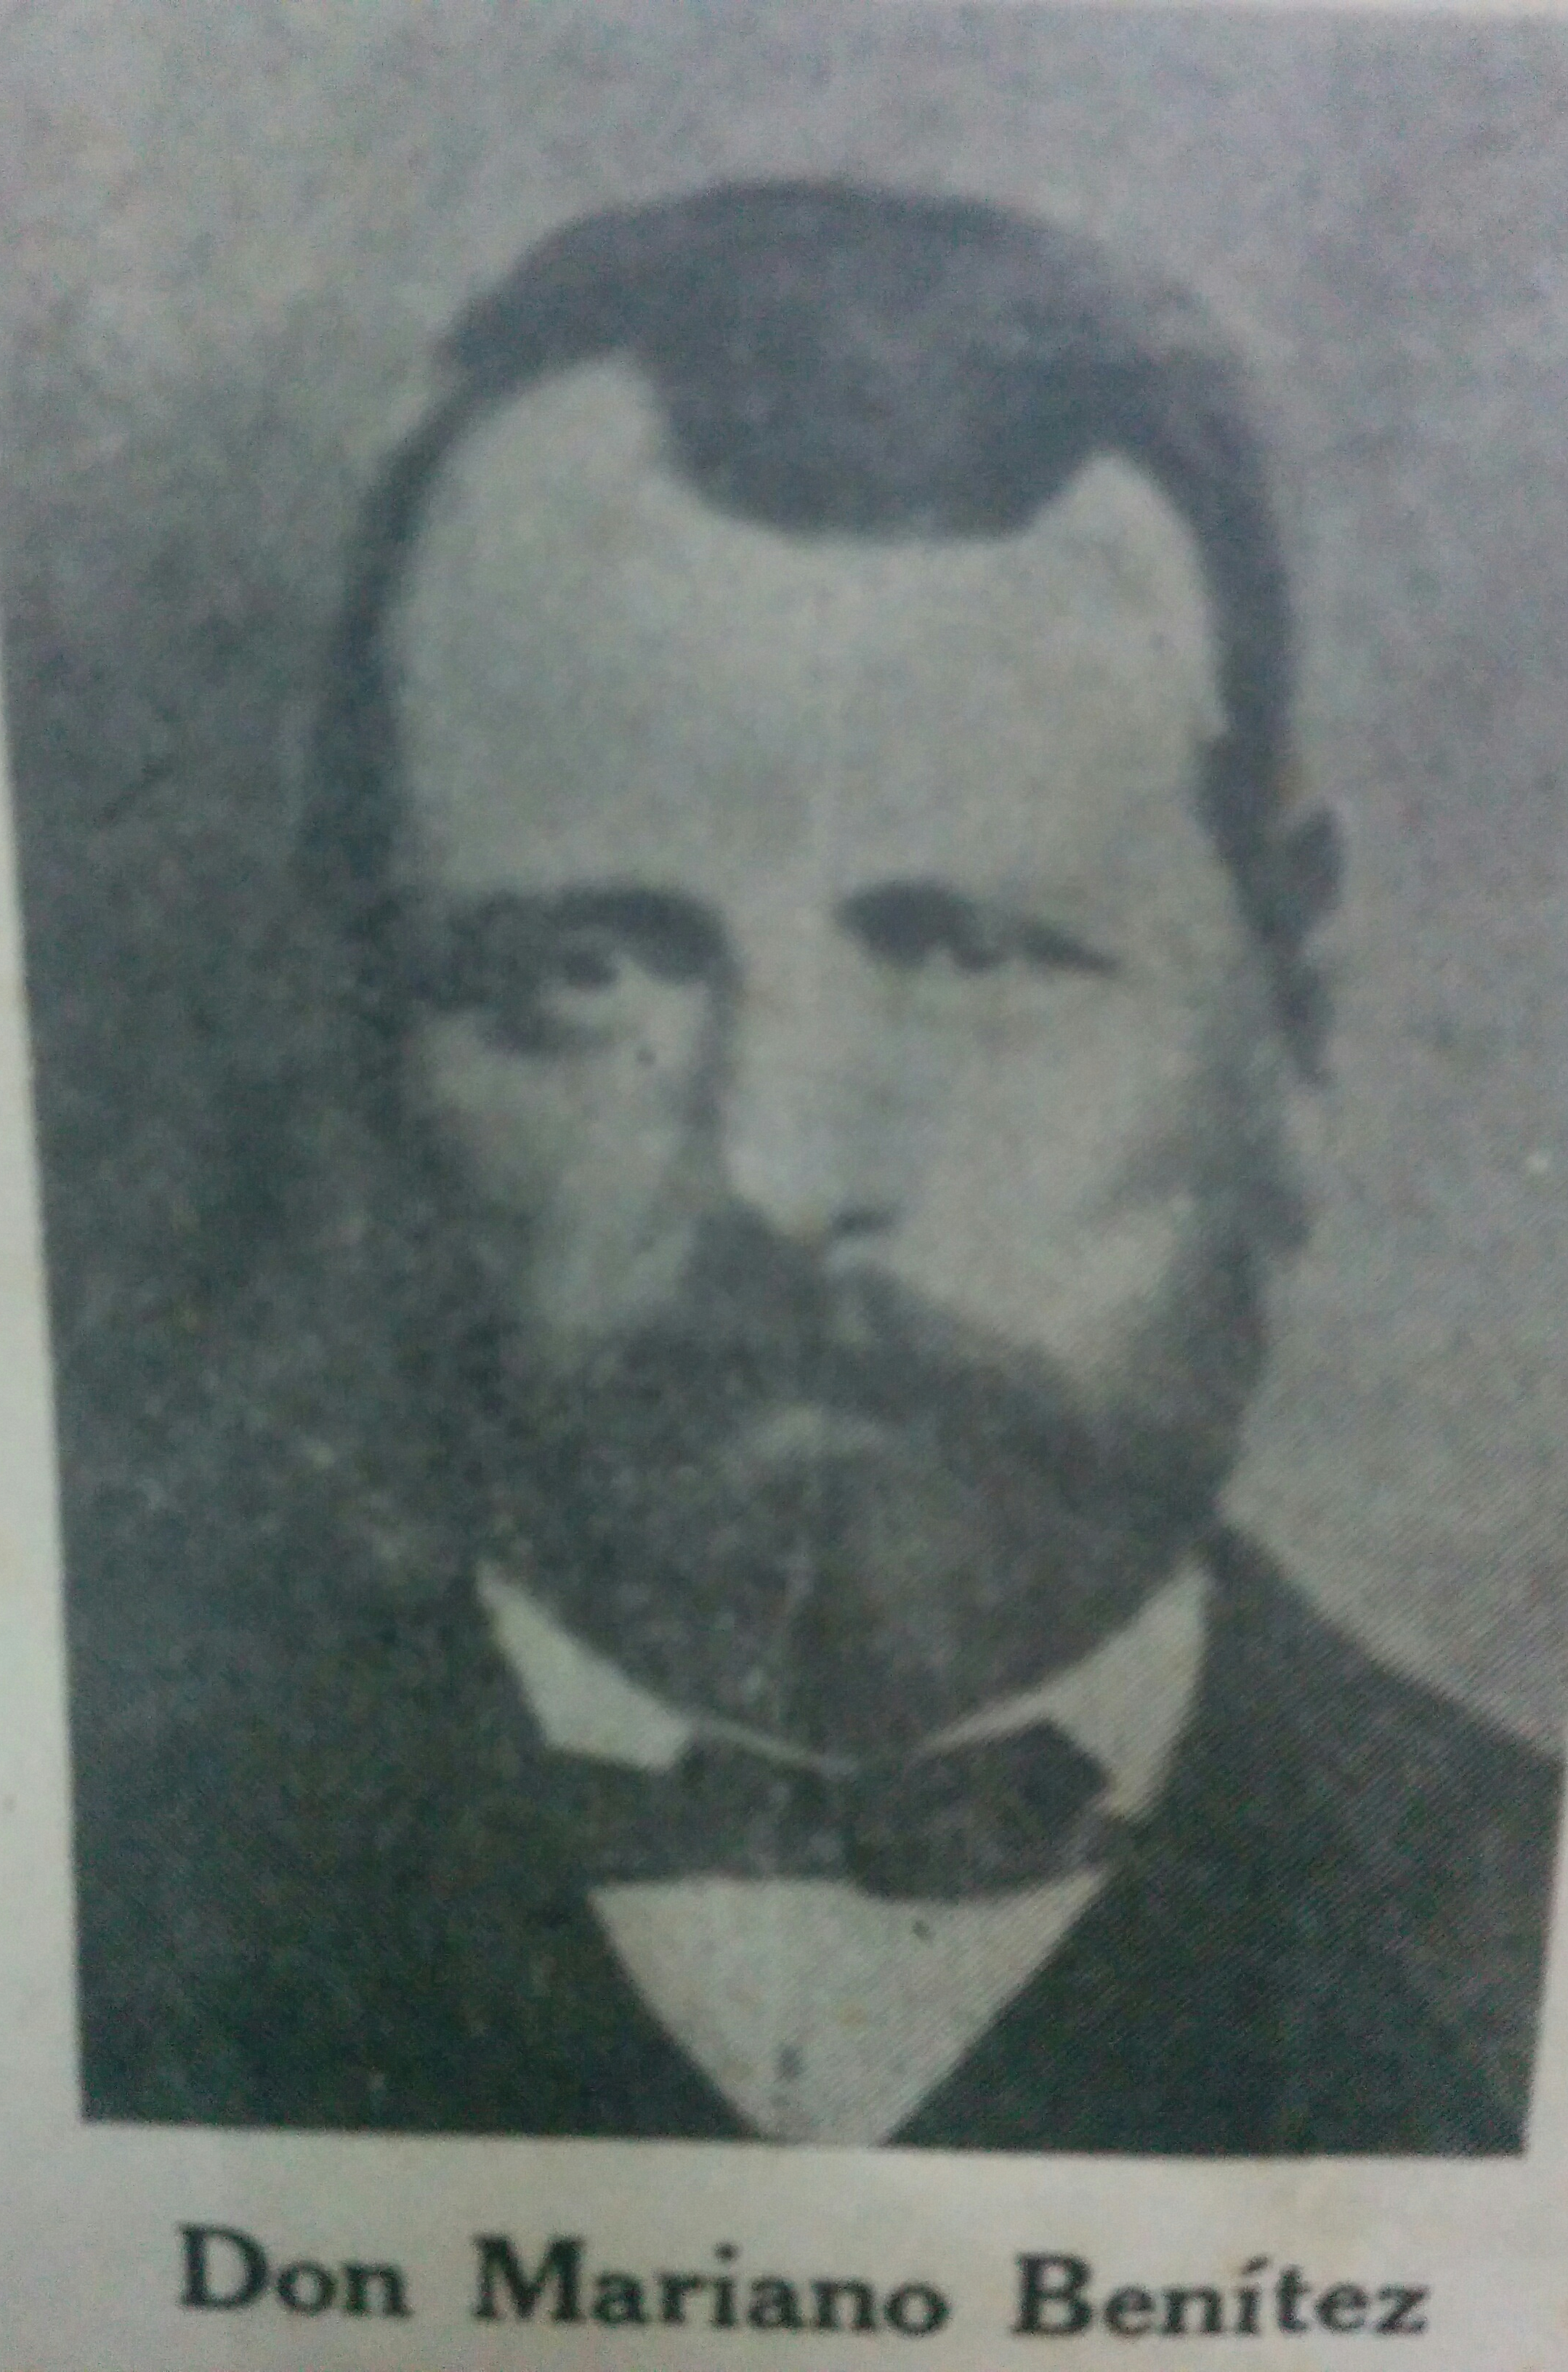 Don Mariano Benítez (1814-1870)